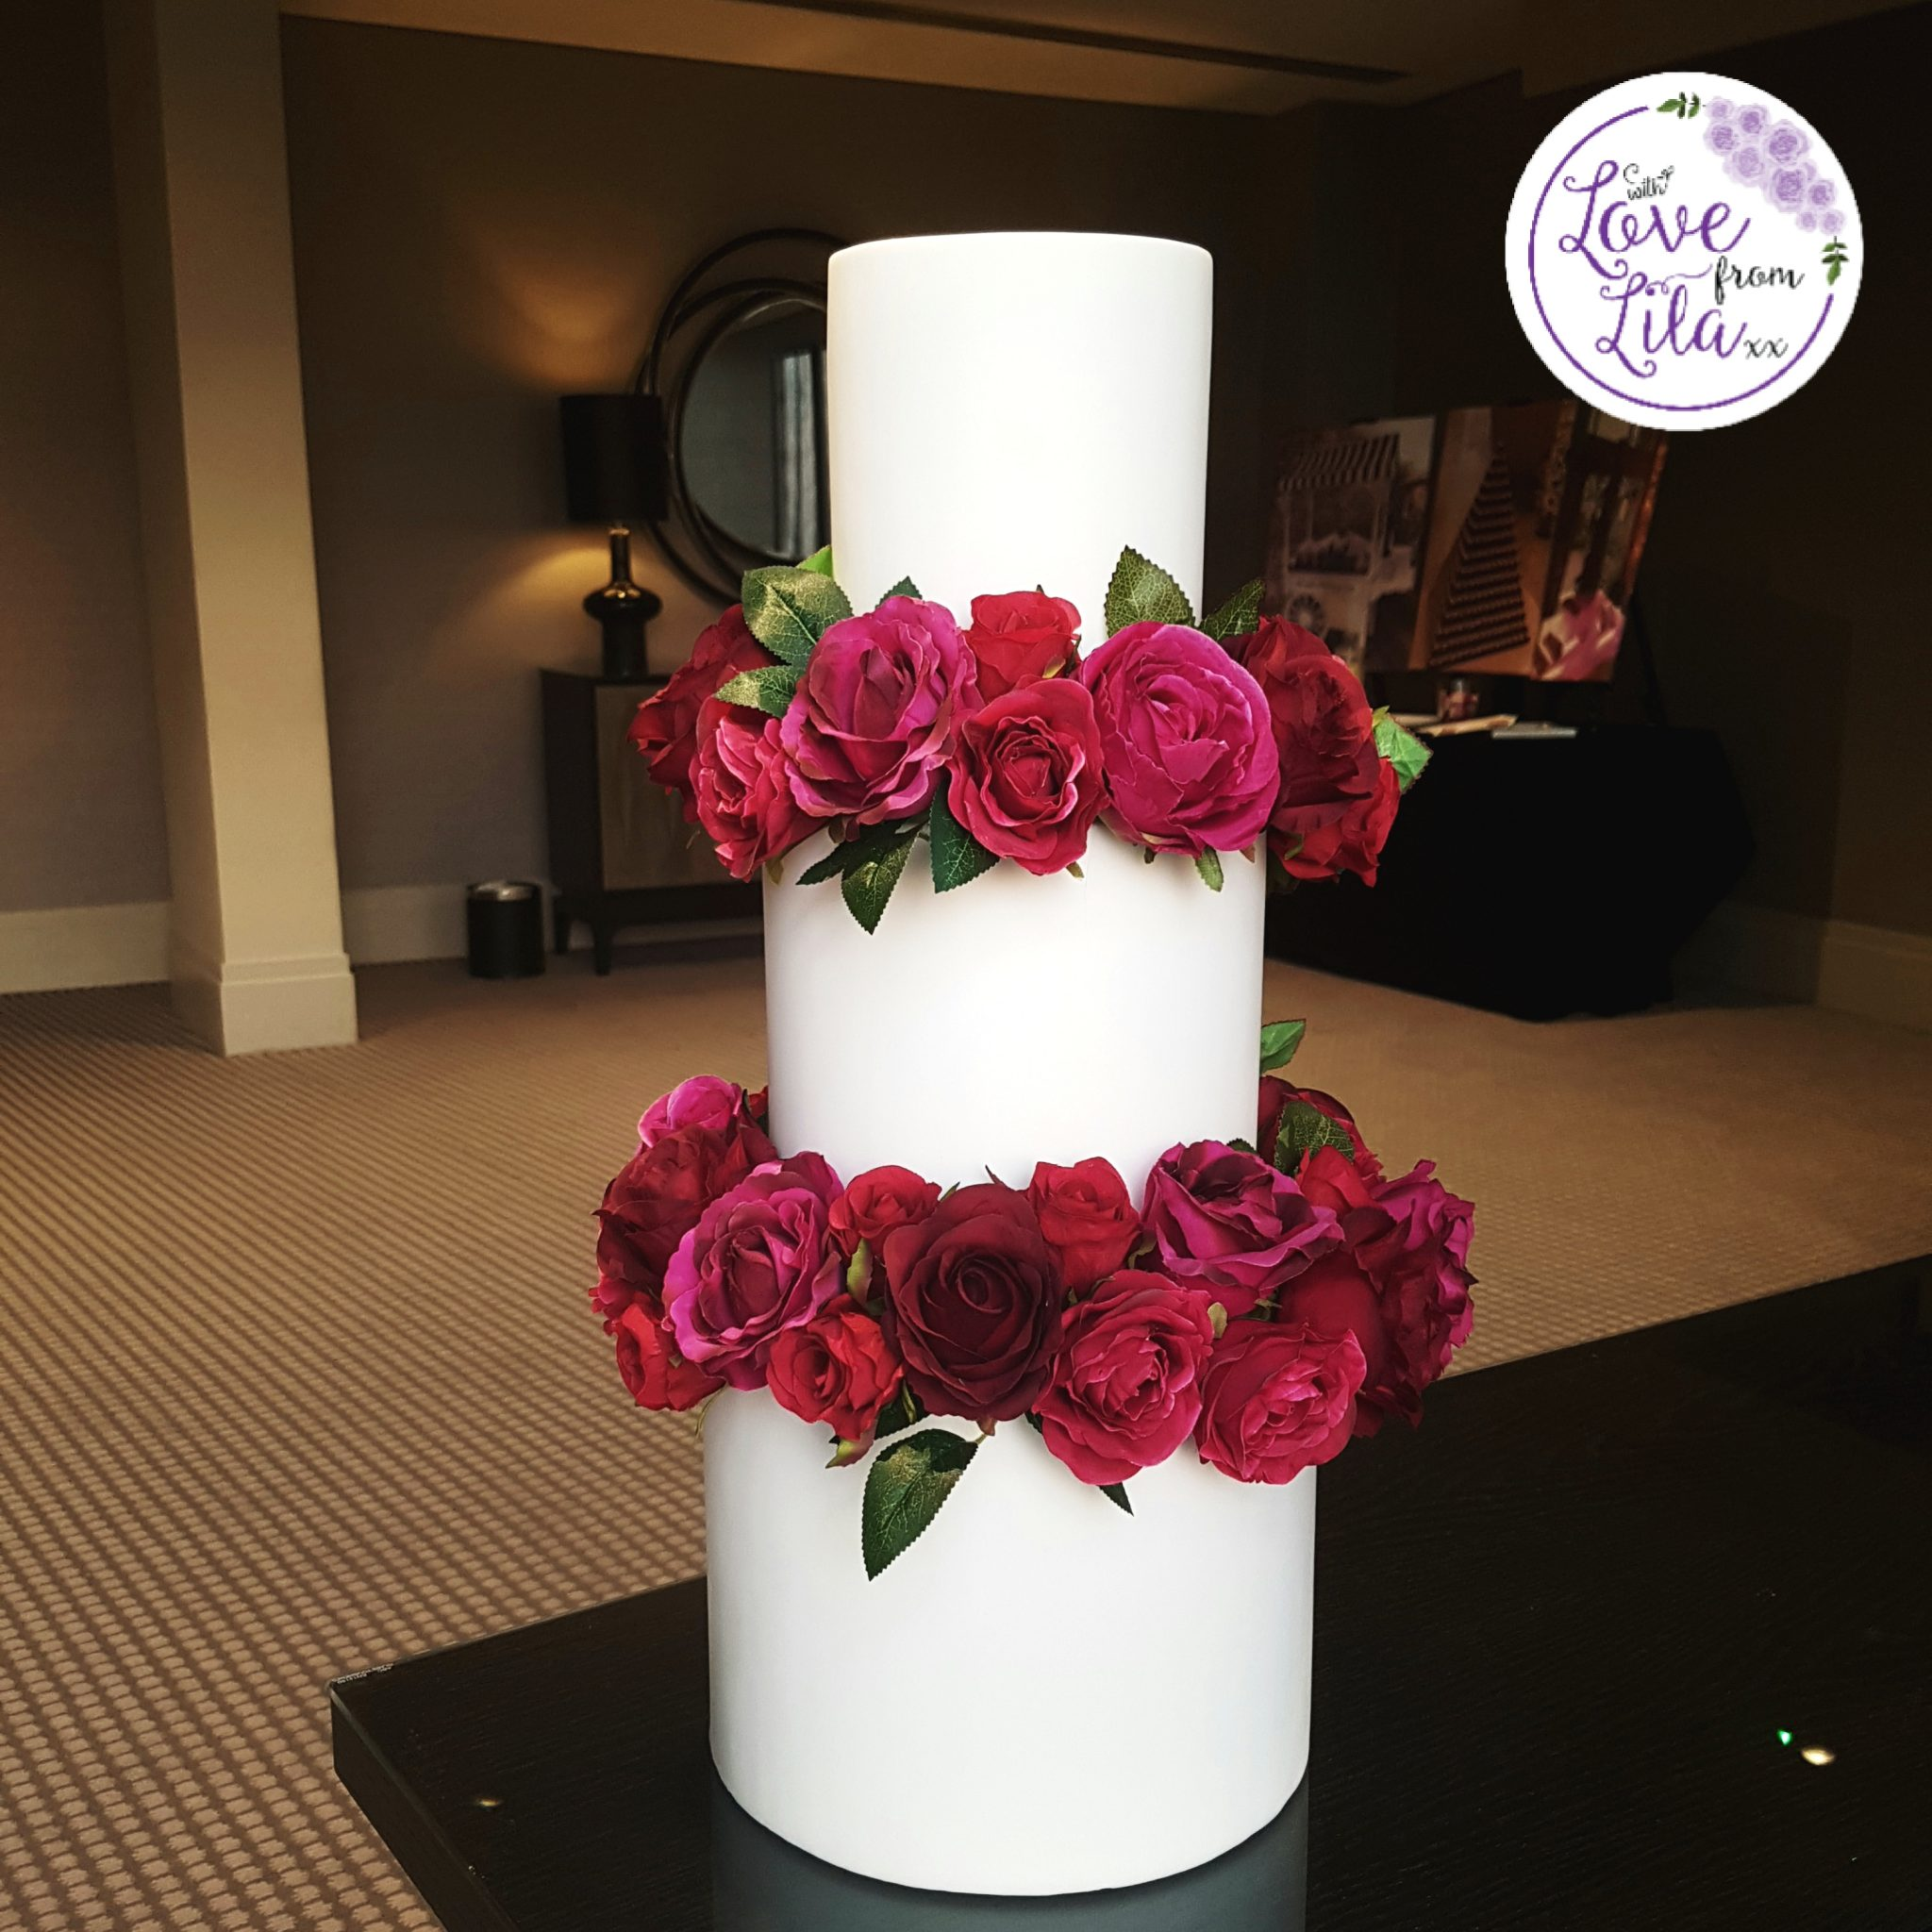 Love from lila xx - Luxury Wedding Cake at the Aviator Hotel Farnborough